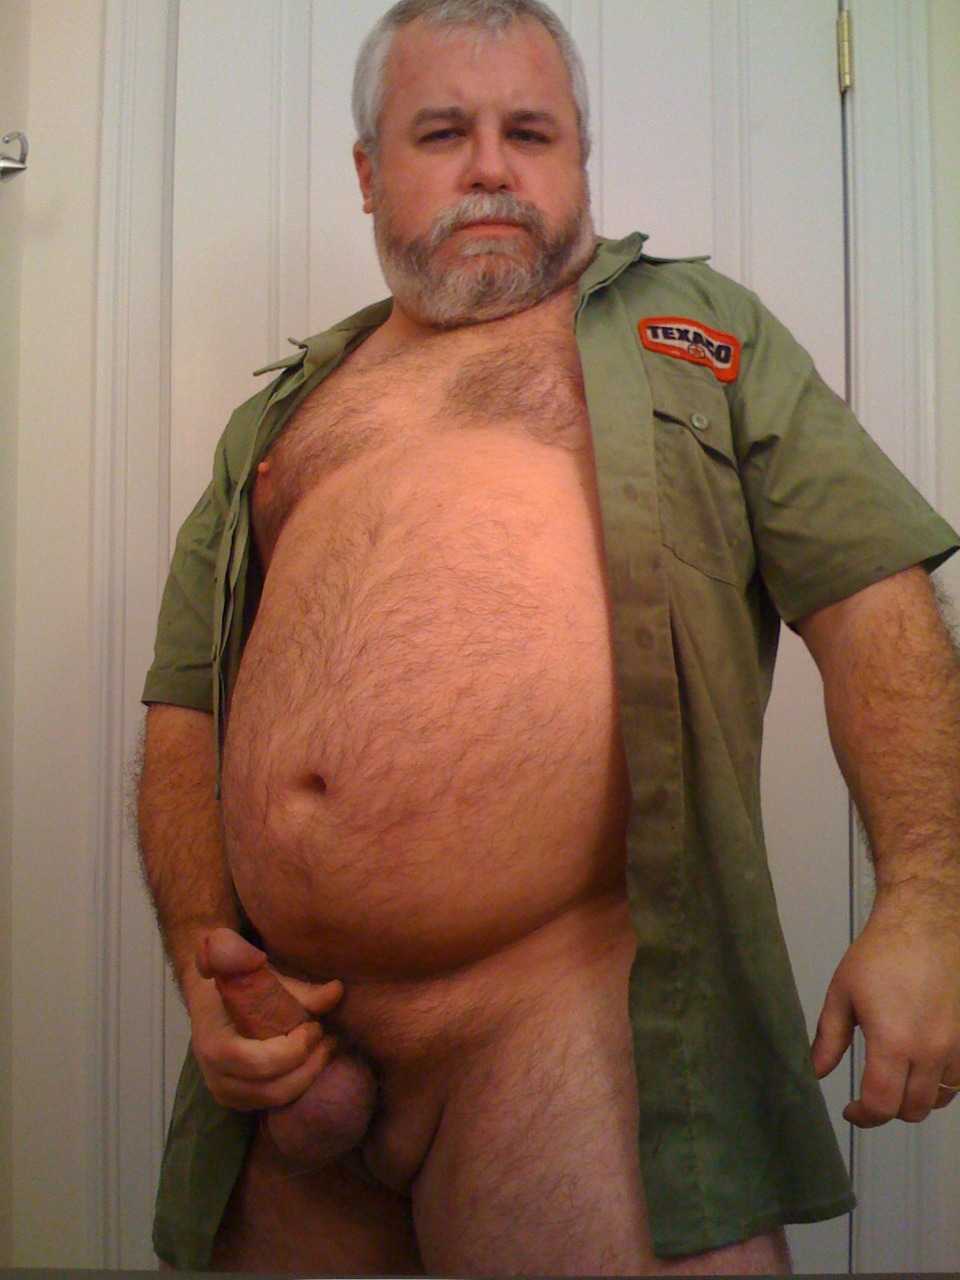 Tumblr Trucker Daddy Bear Cock - Hot Girls Wallpaper